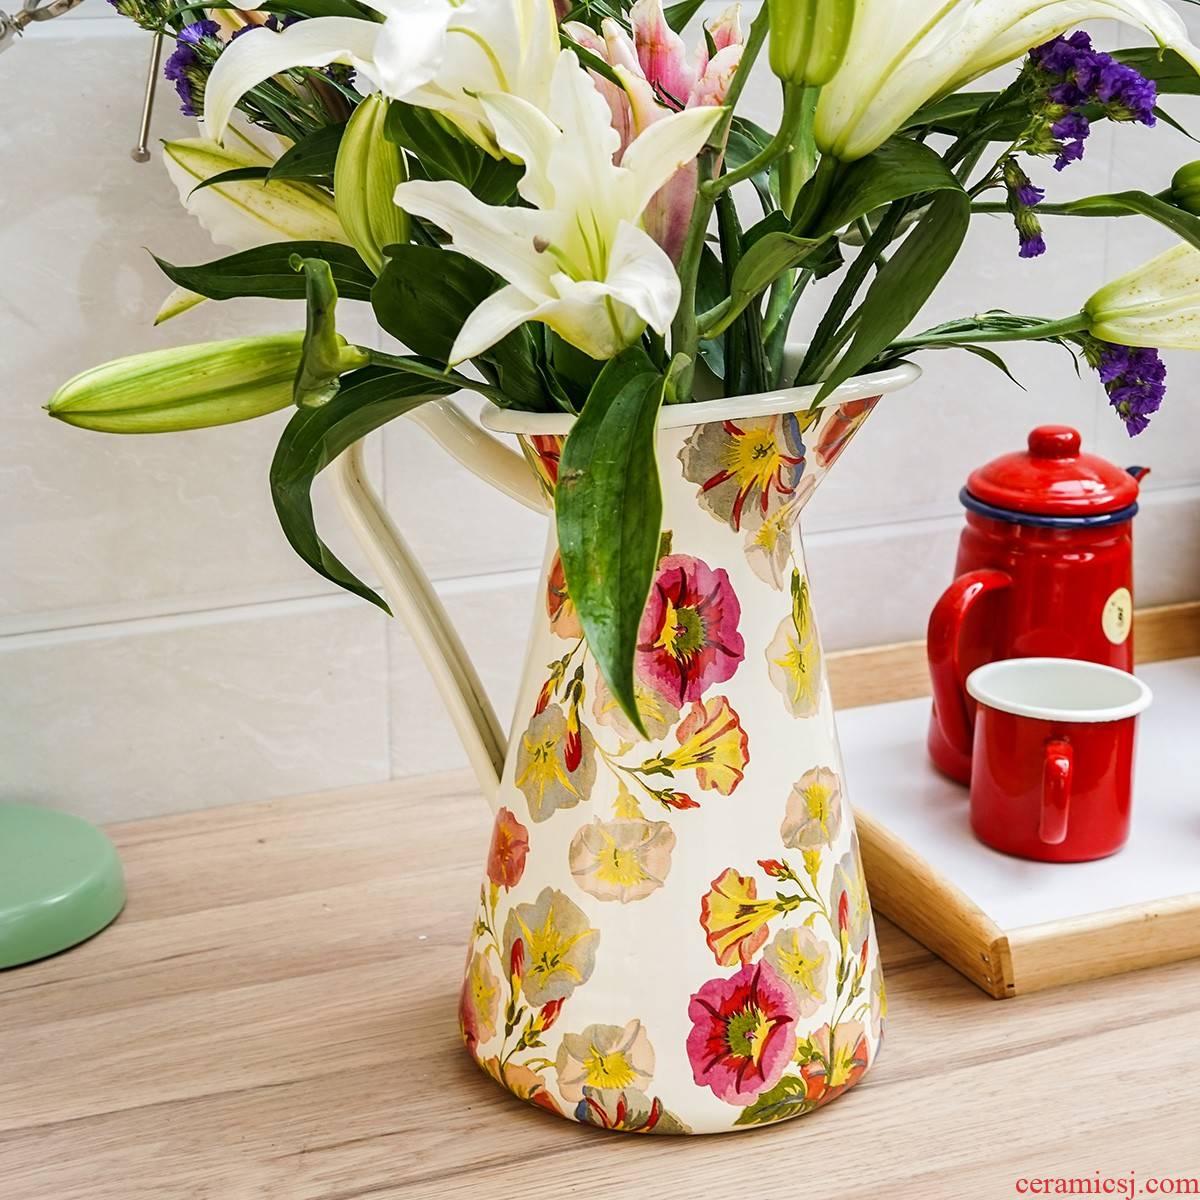 Japanese fertilizer dragon flowers with thick enamel 3.5 L household enamel export large vase bottle decoration